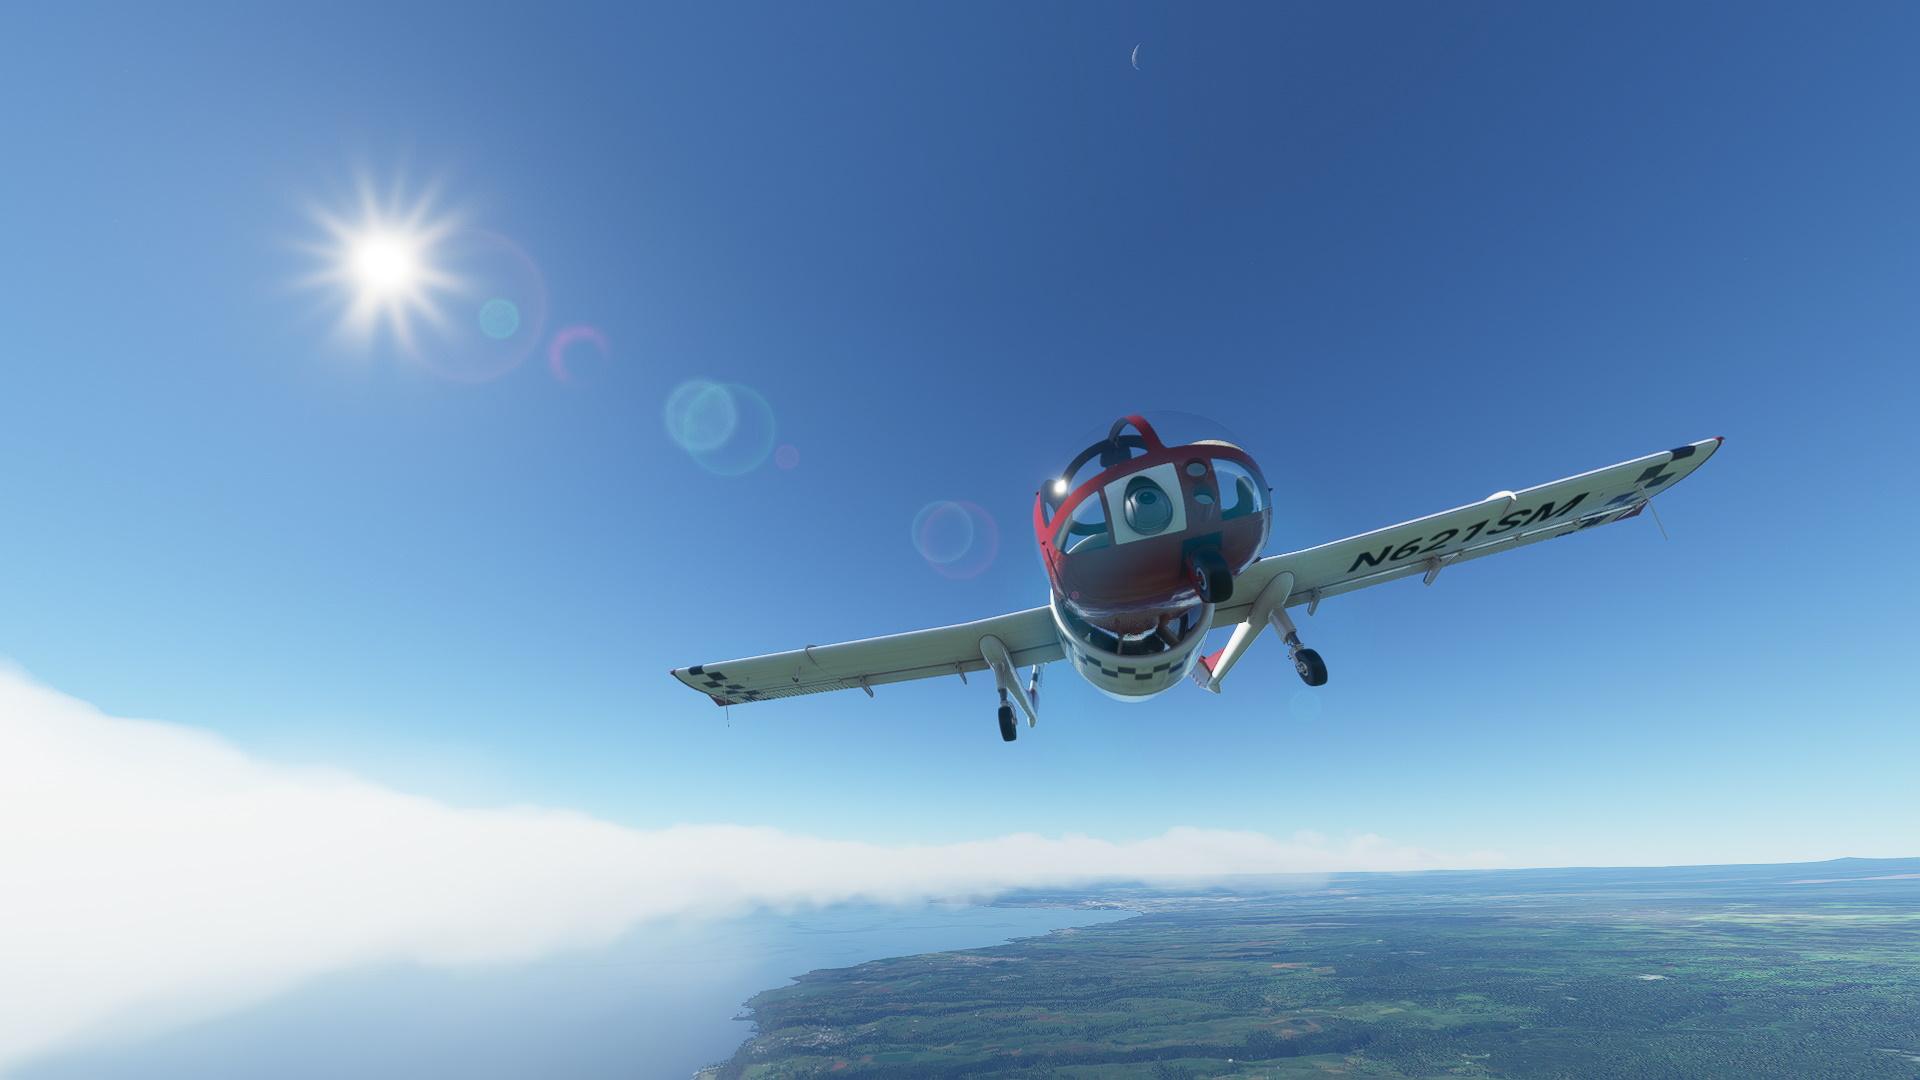 She is sweet for the Microsoft Flight ORBX-7 Edgley Optics